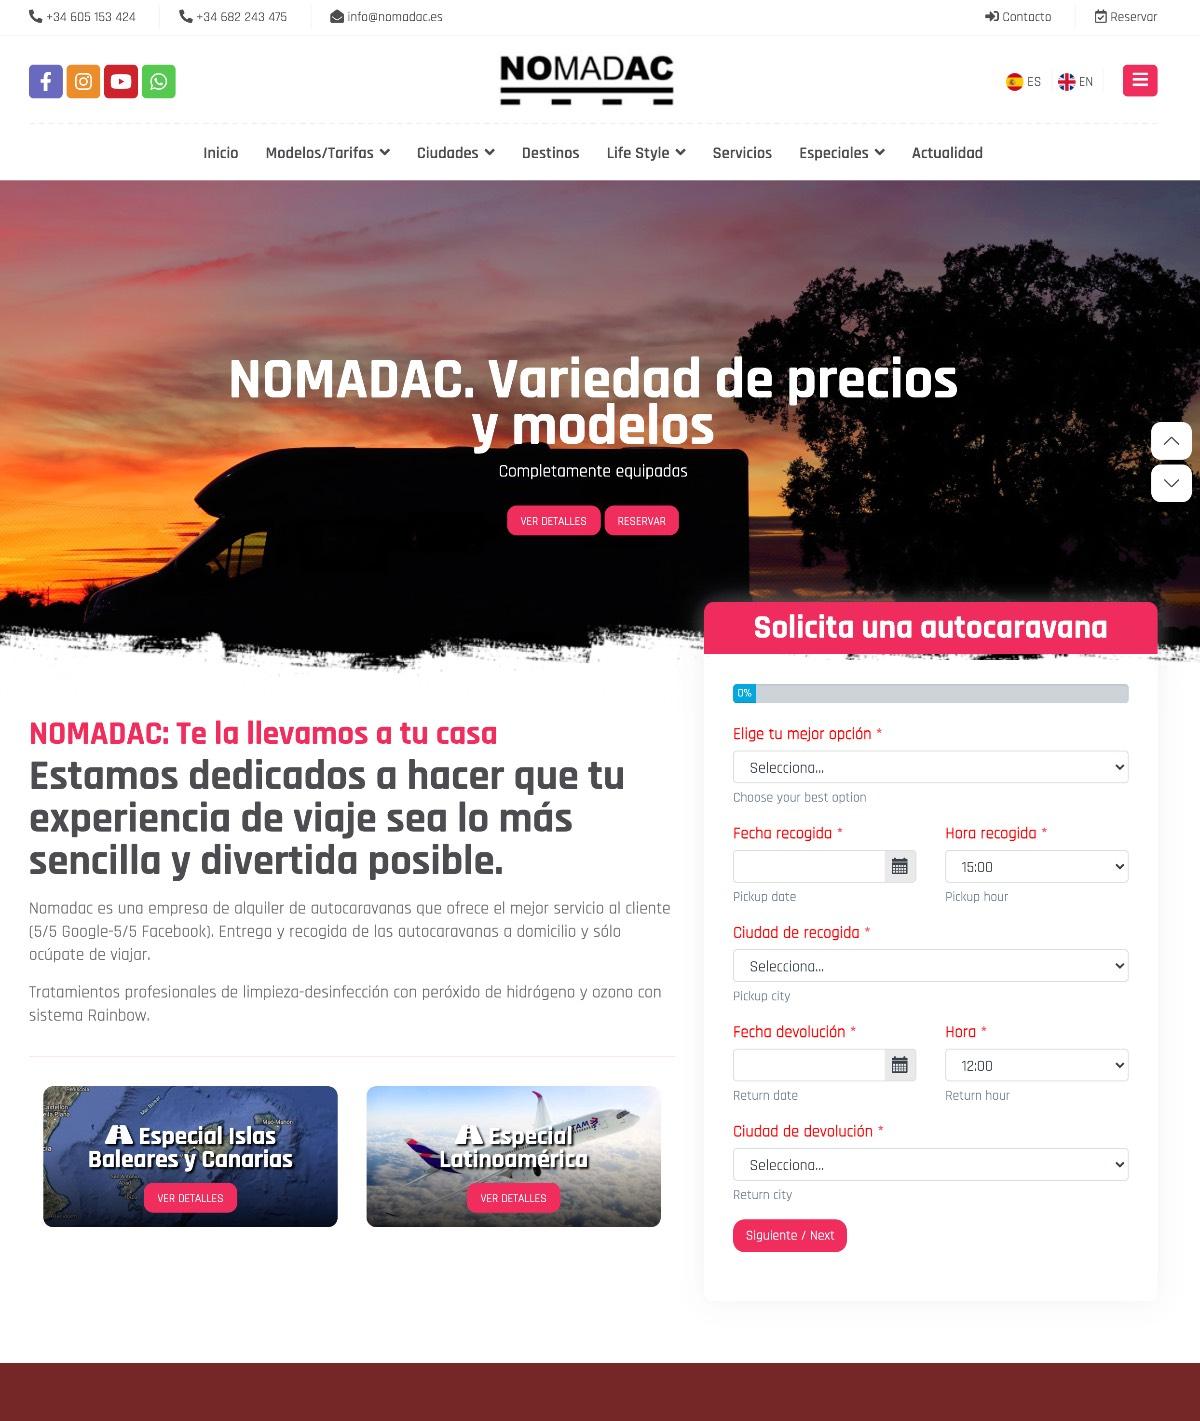 NOMADAC